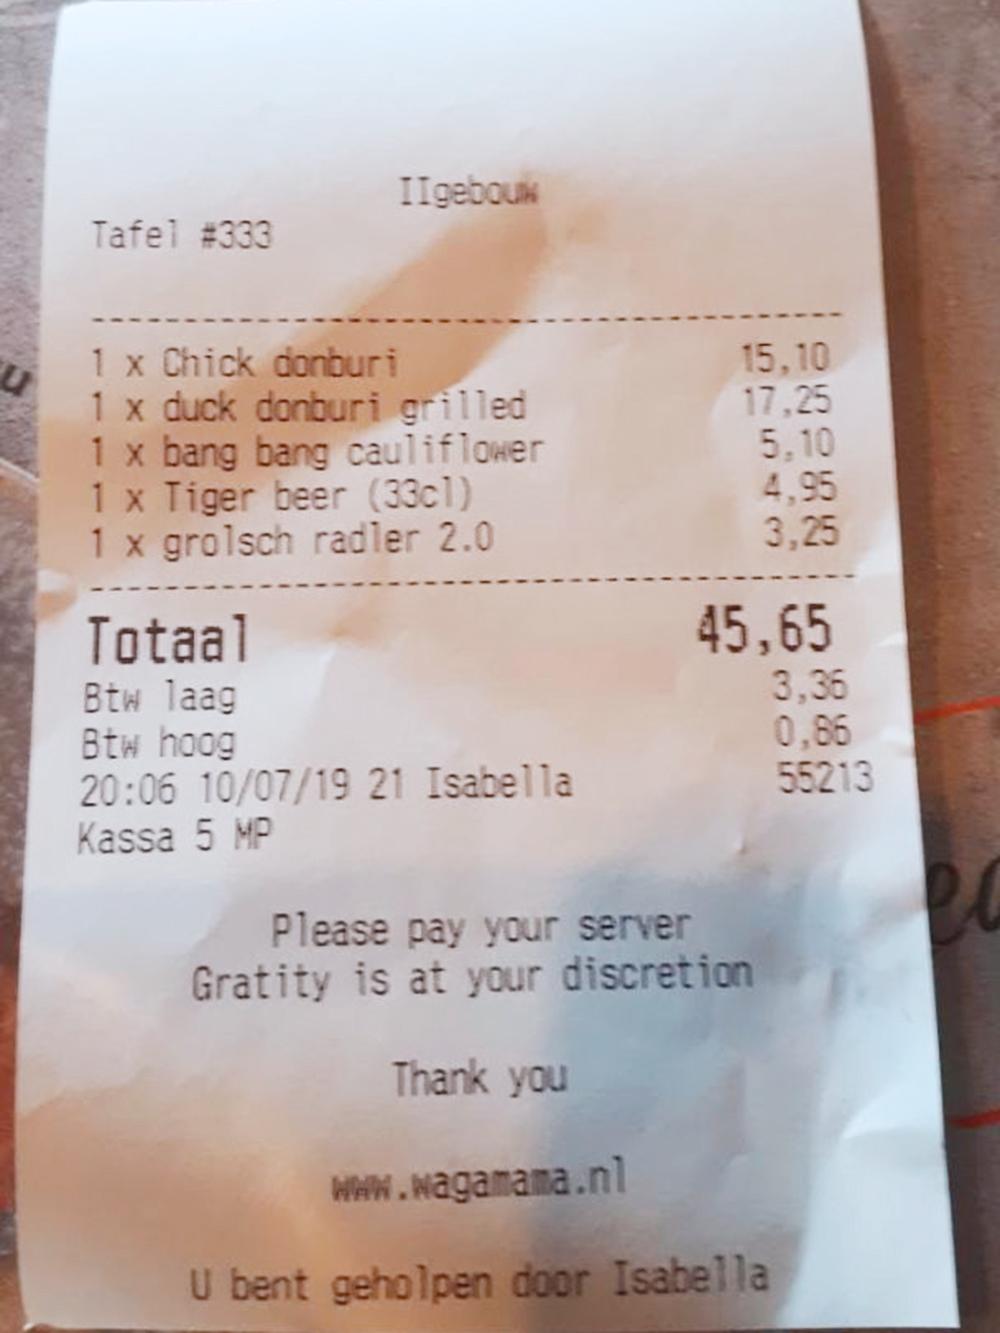 Счет за обед на двоих в сетевом кафе Wagamama